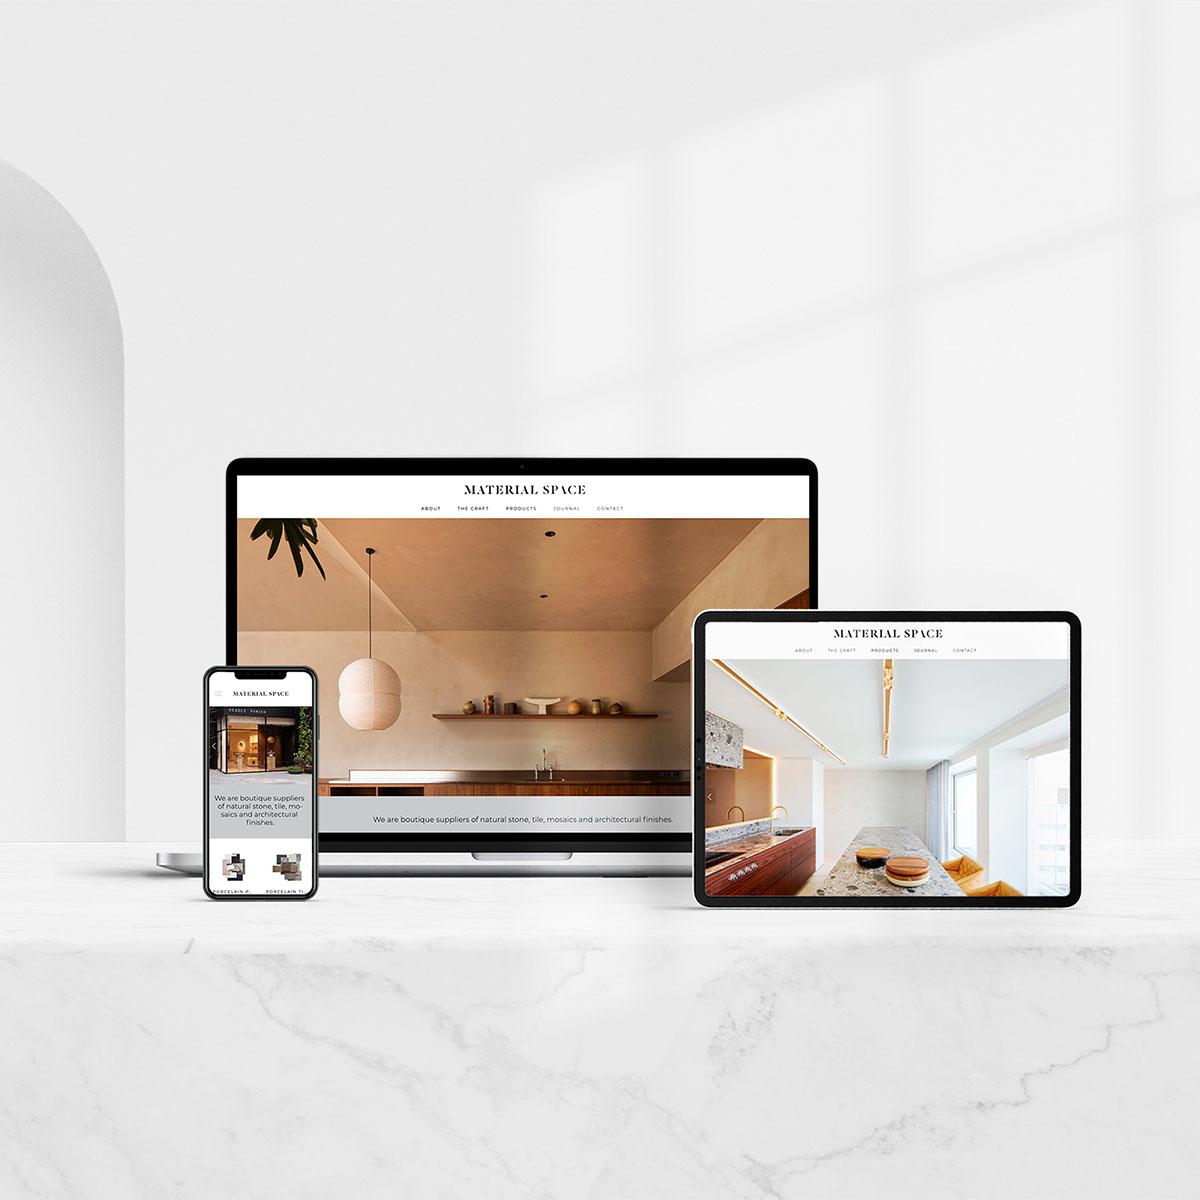 Brand Identity and Website